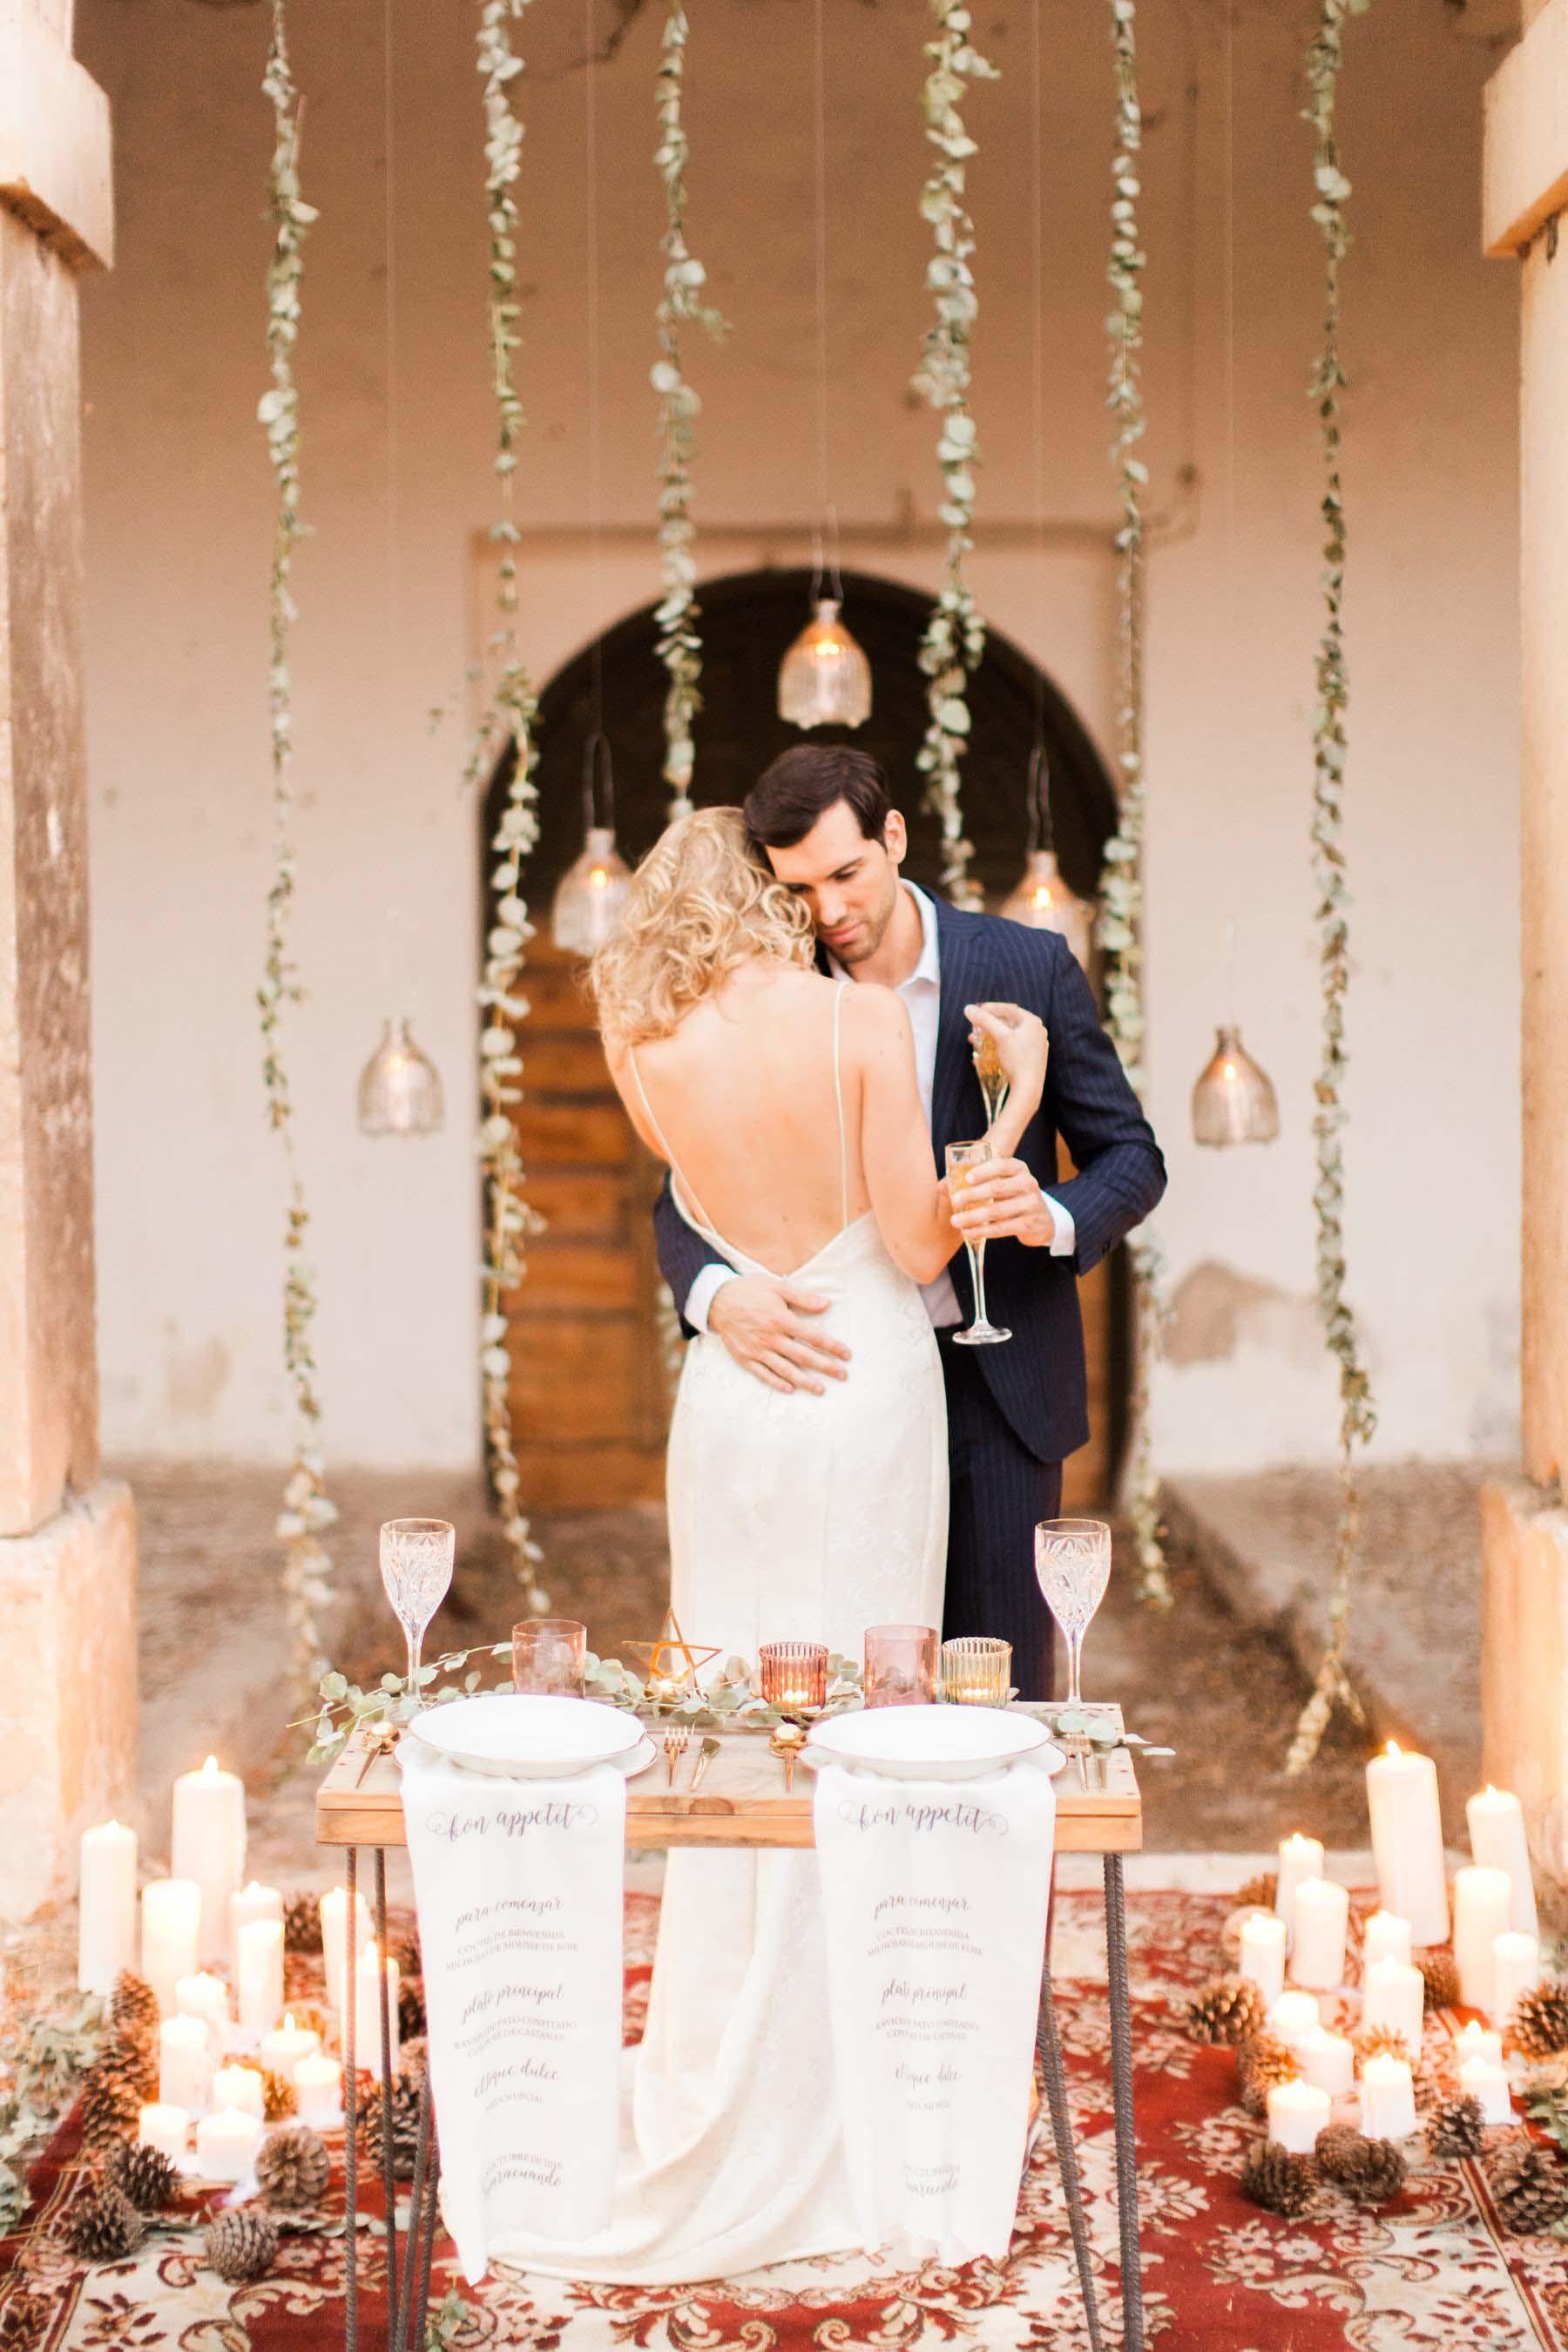 fotografo de bodas Jairo Crena-280